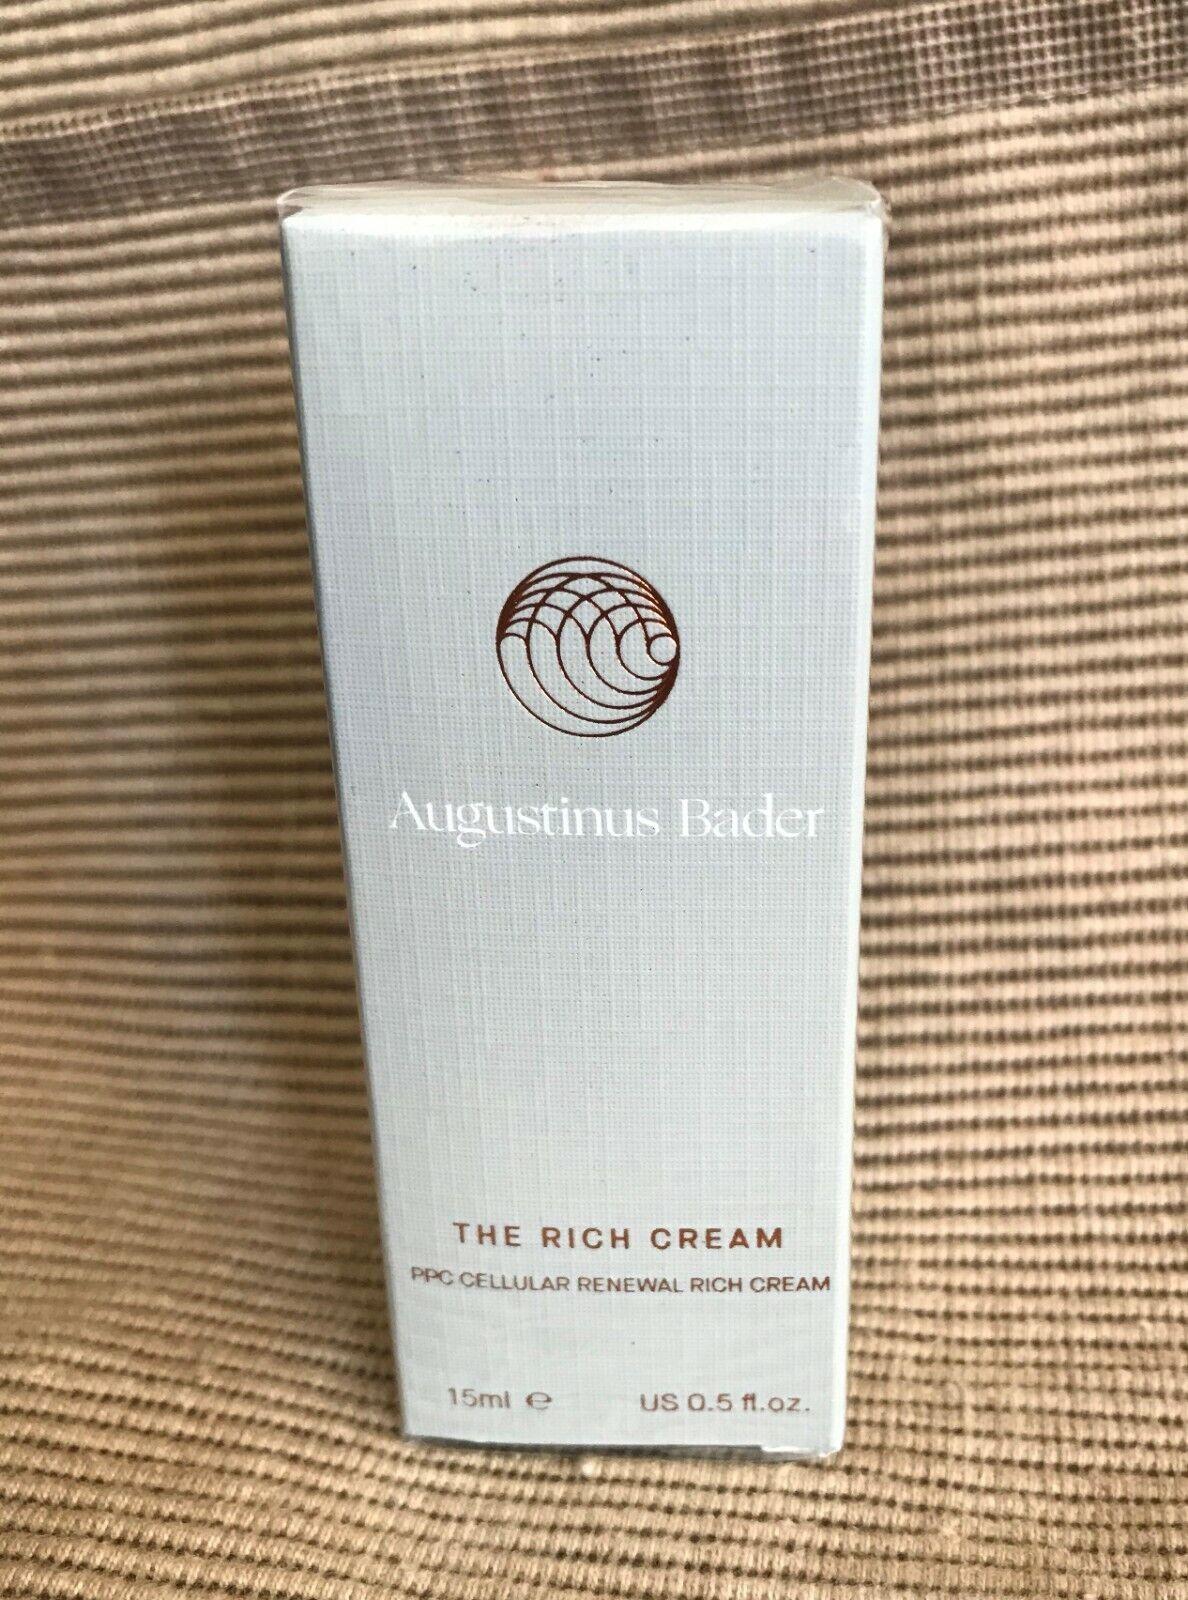 New Sealed Augustinus Bader The Rich Cream 15ML .5 Oz See Description - $69.99